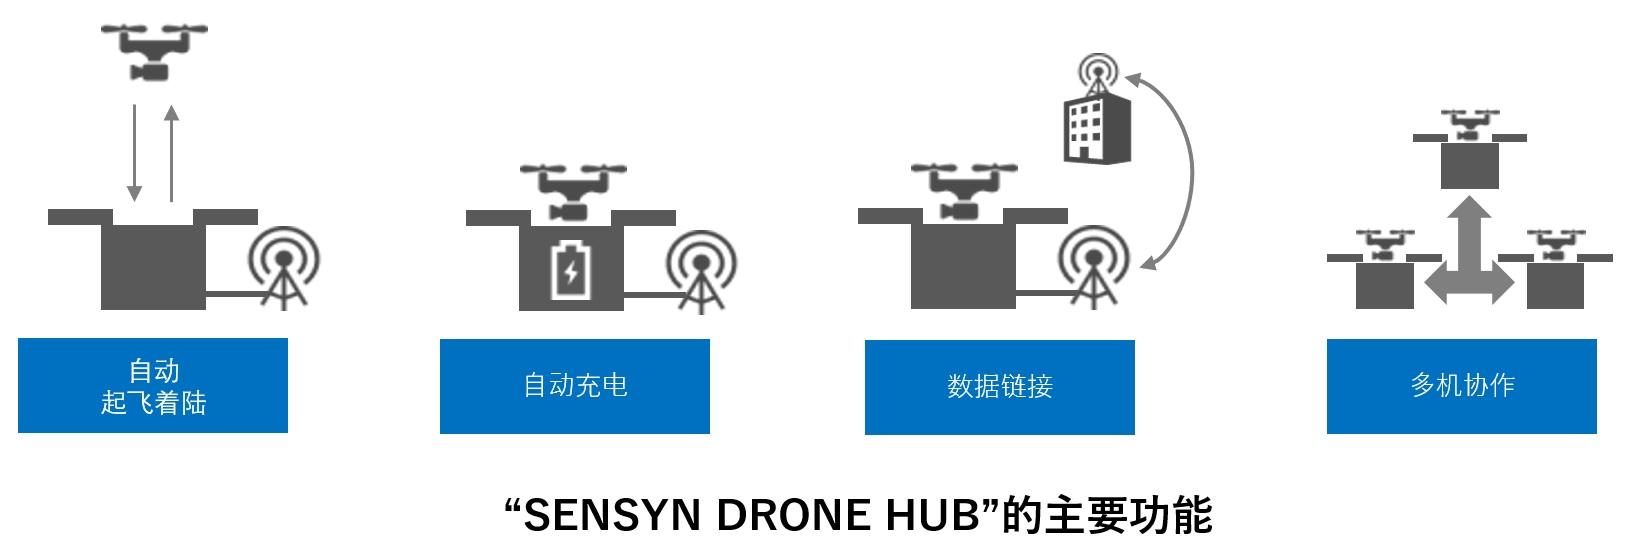 dronehub_cn